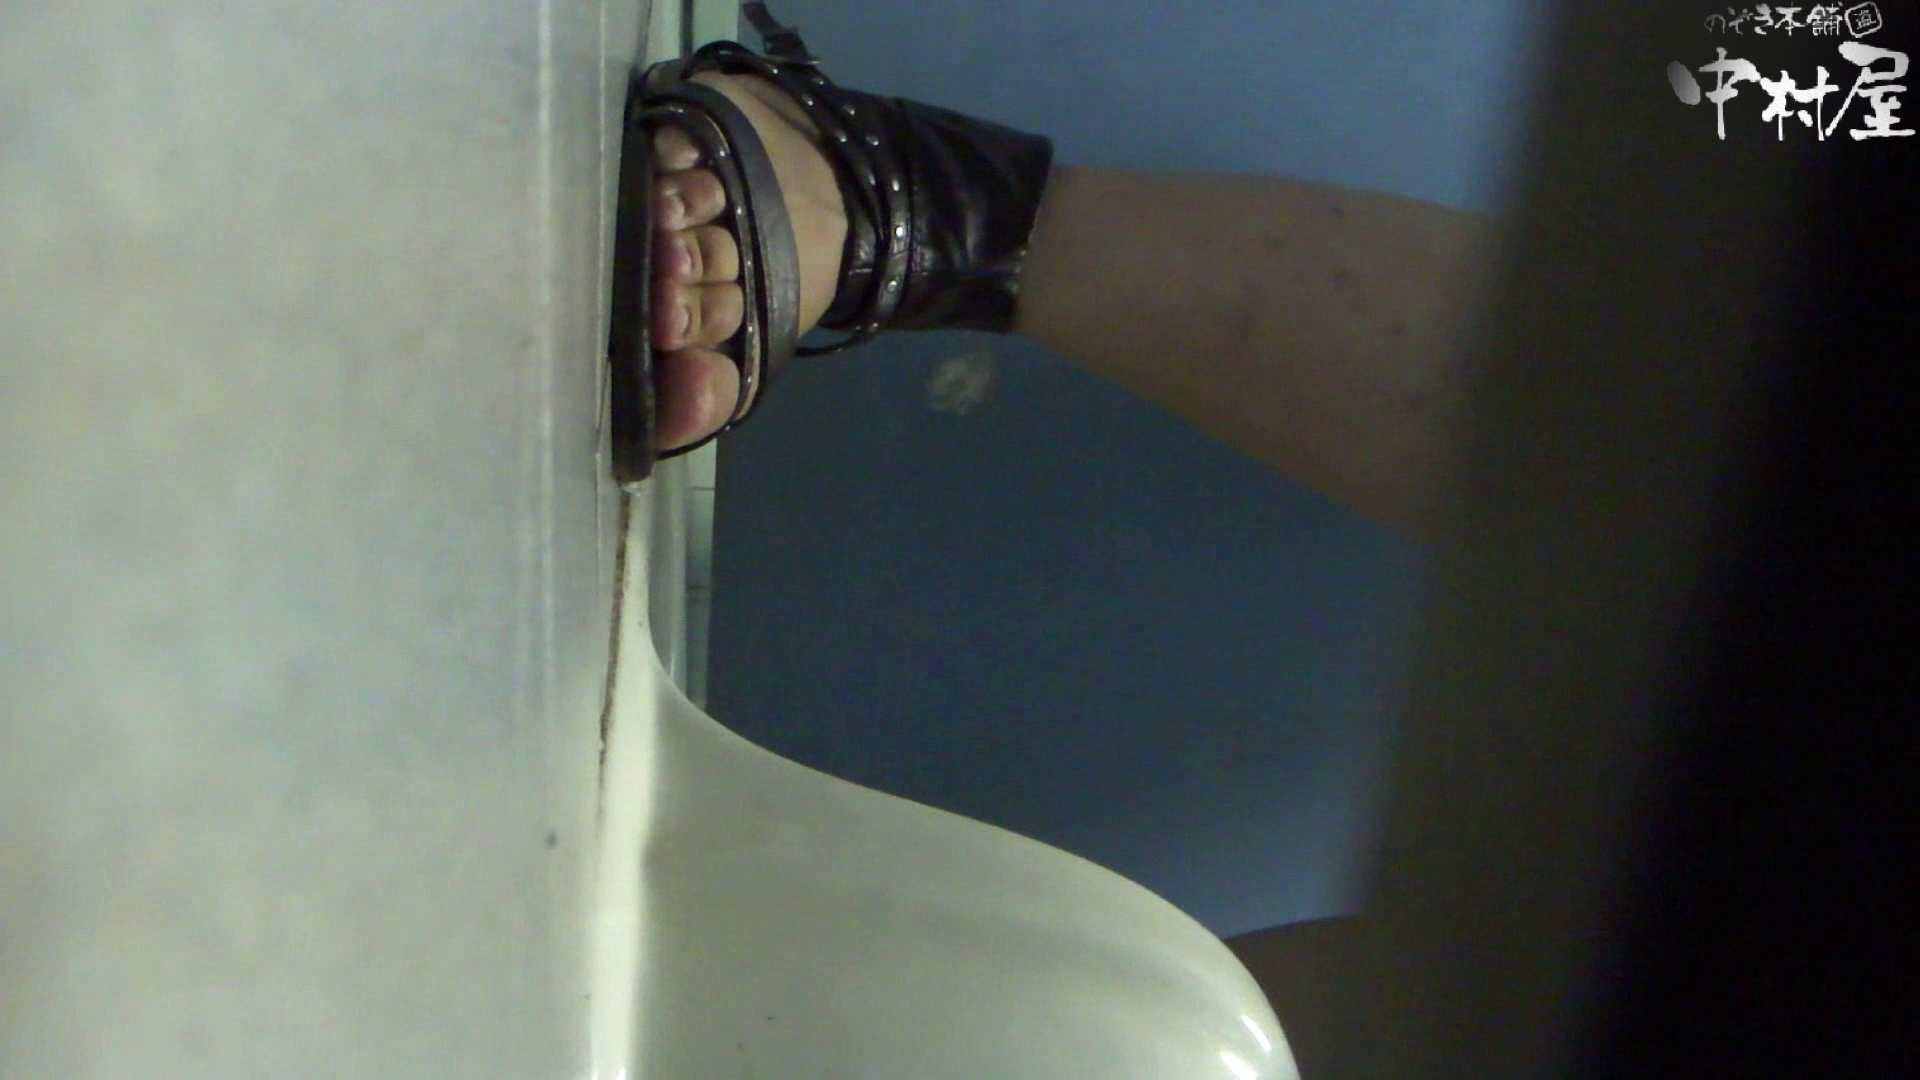 GOD HAND ファッションショッピングセンター盗撮vol.07 OLのエロ生活 AV無料動画キャプチャ 25連発 17